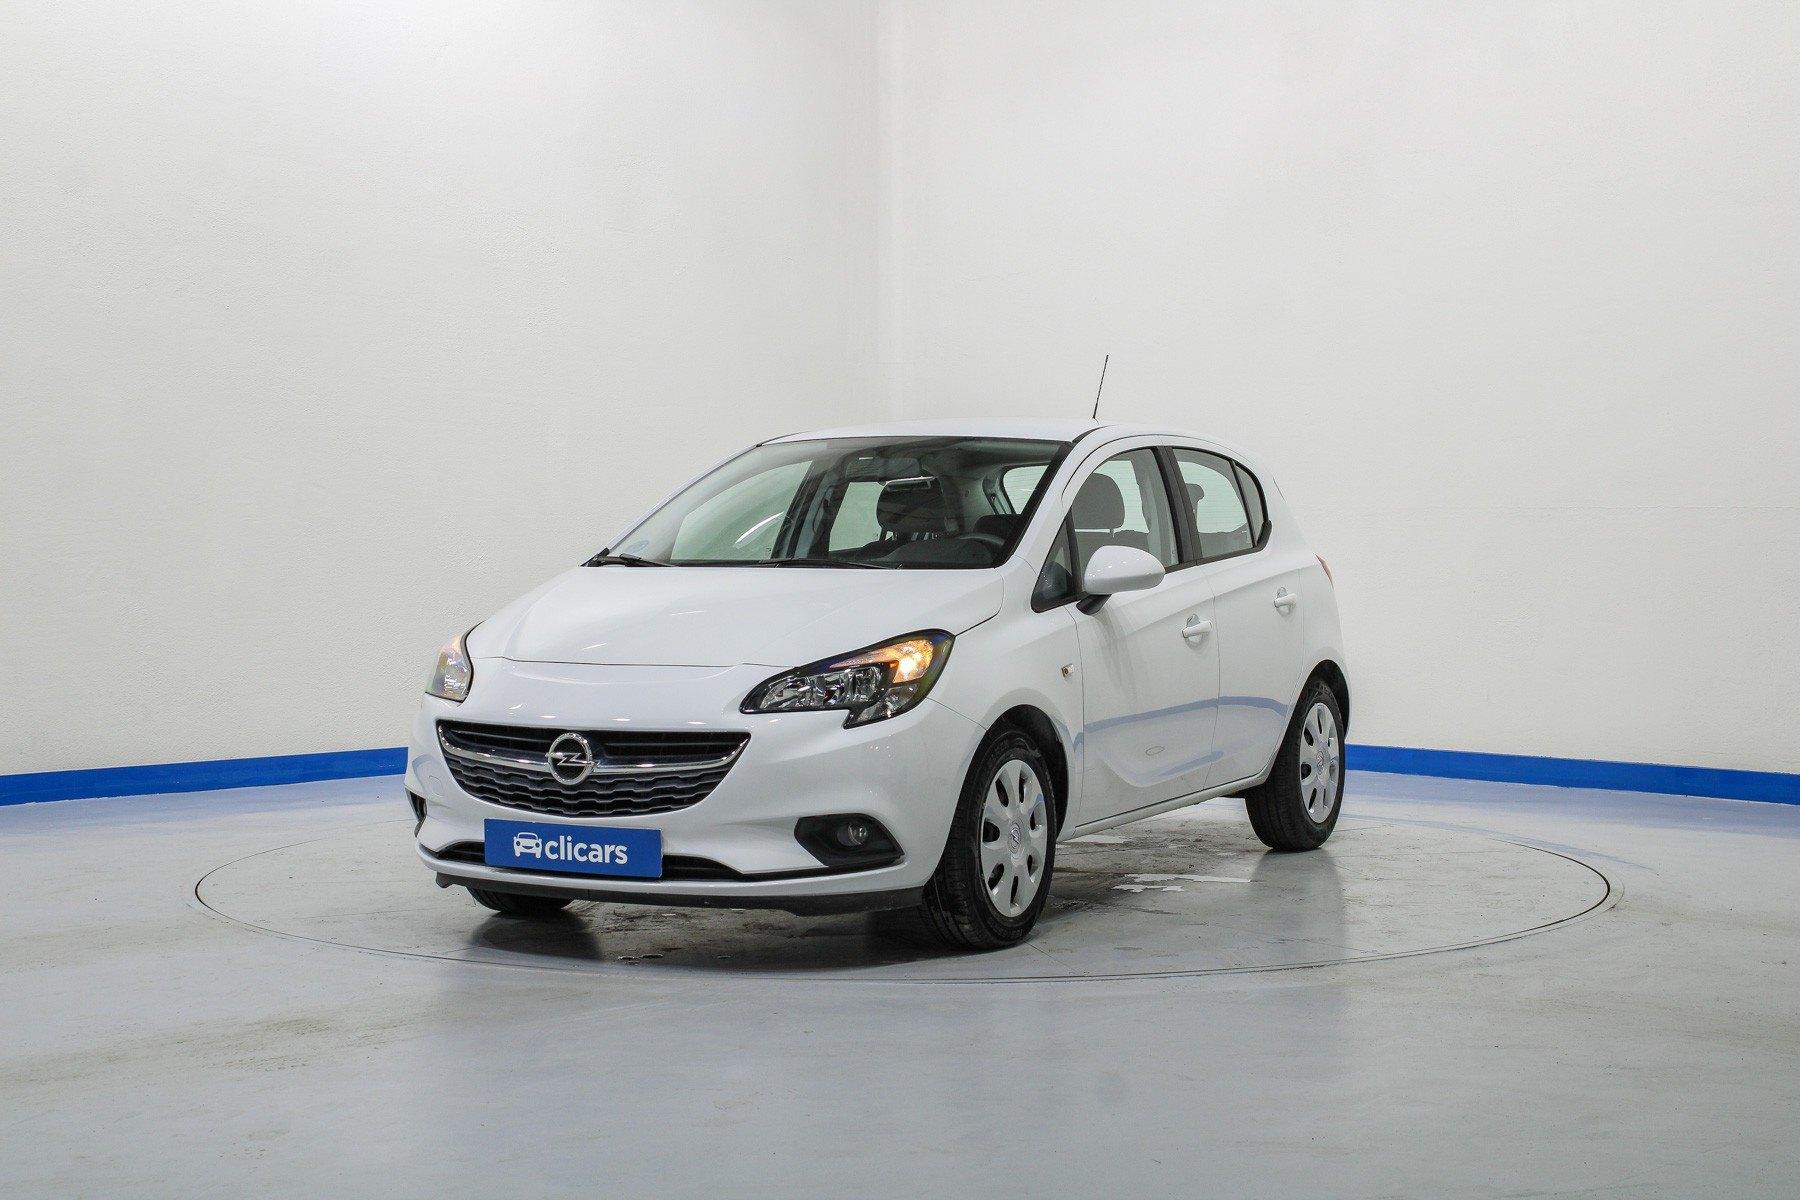 Opel Corsa Gasolina 1.4 66kW (90CV) Selective Pro 1